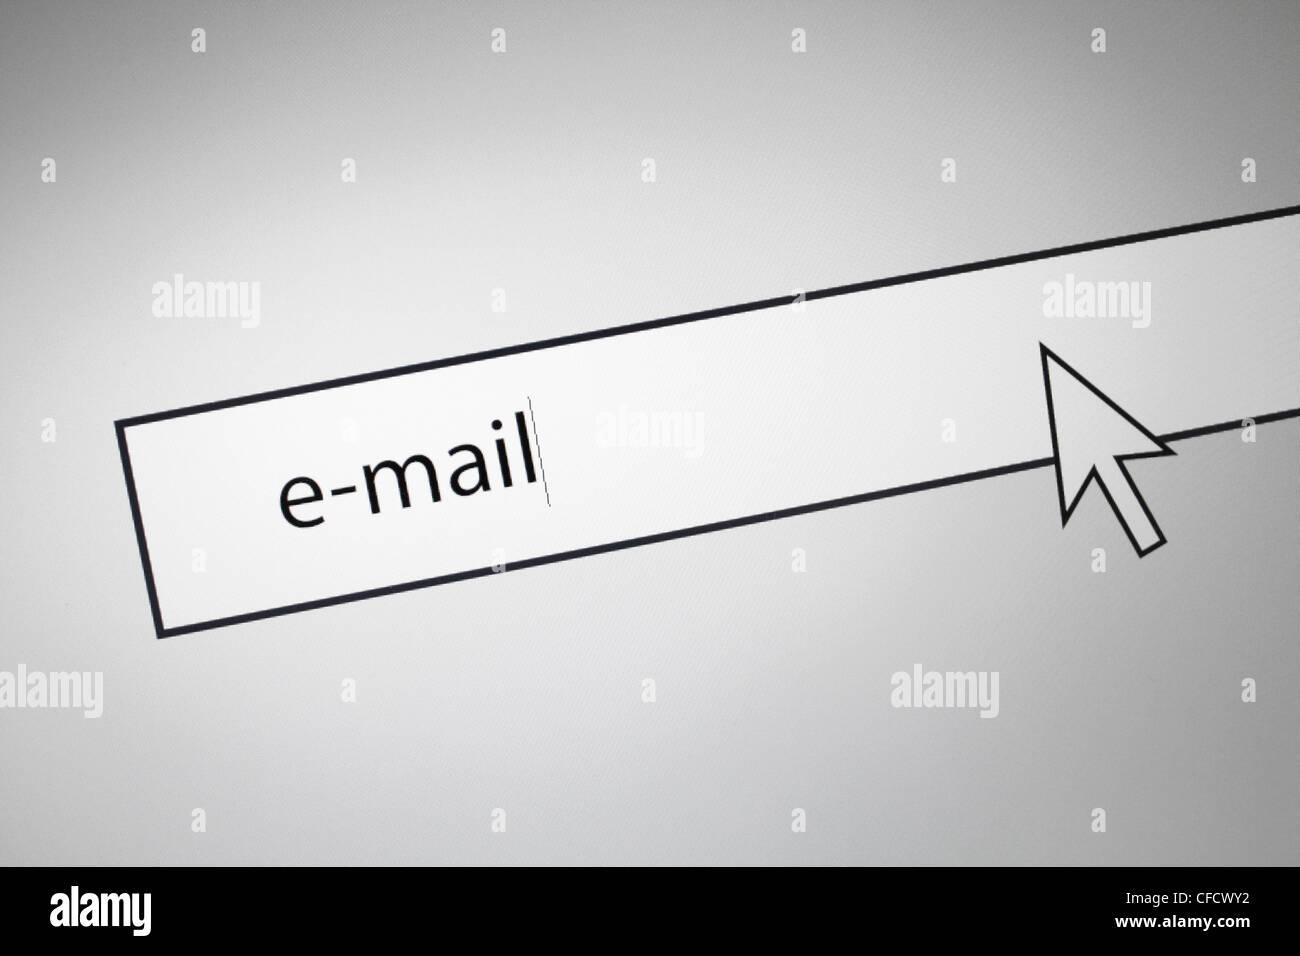 E-mail - Stock Image